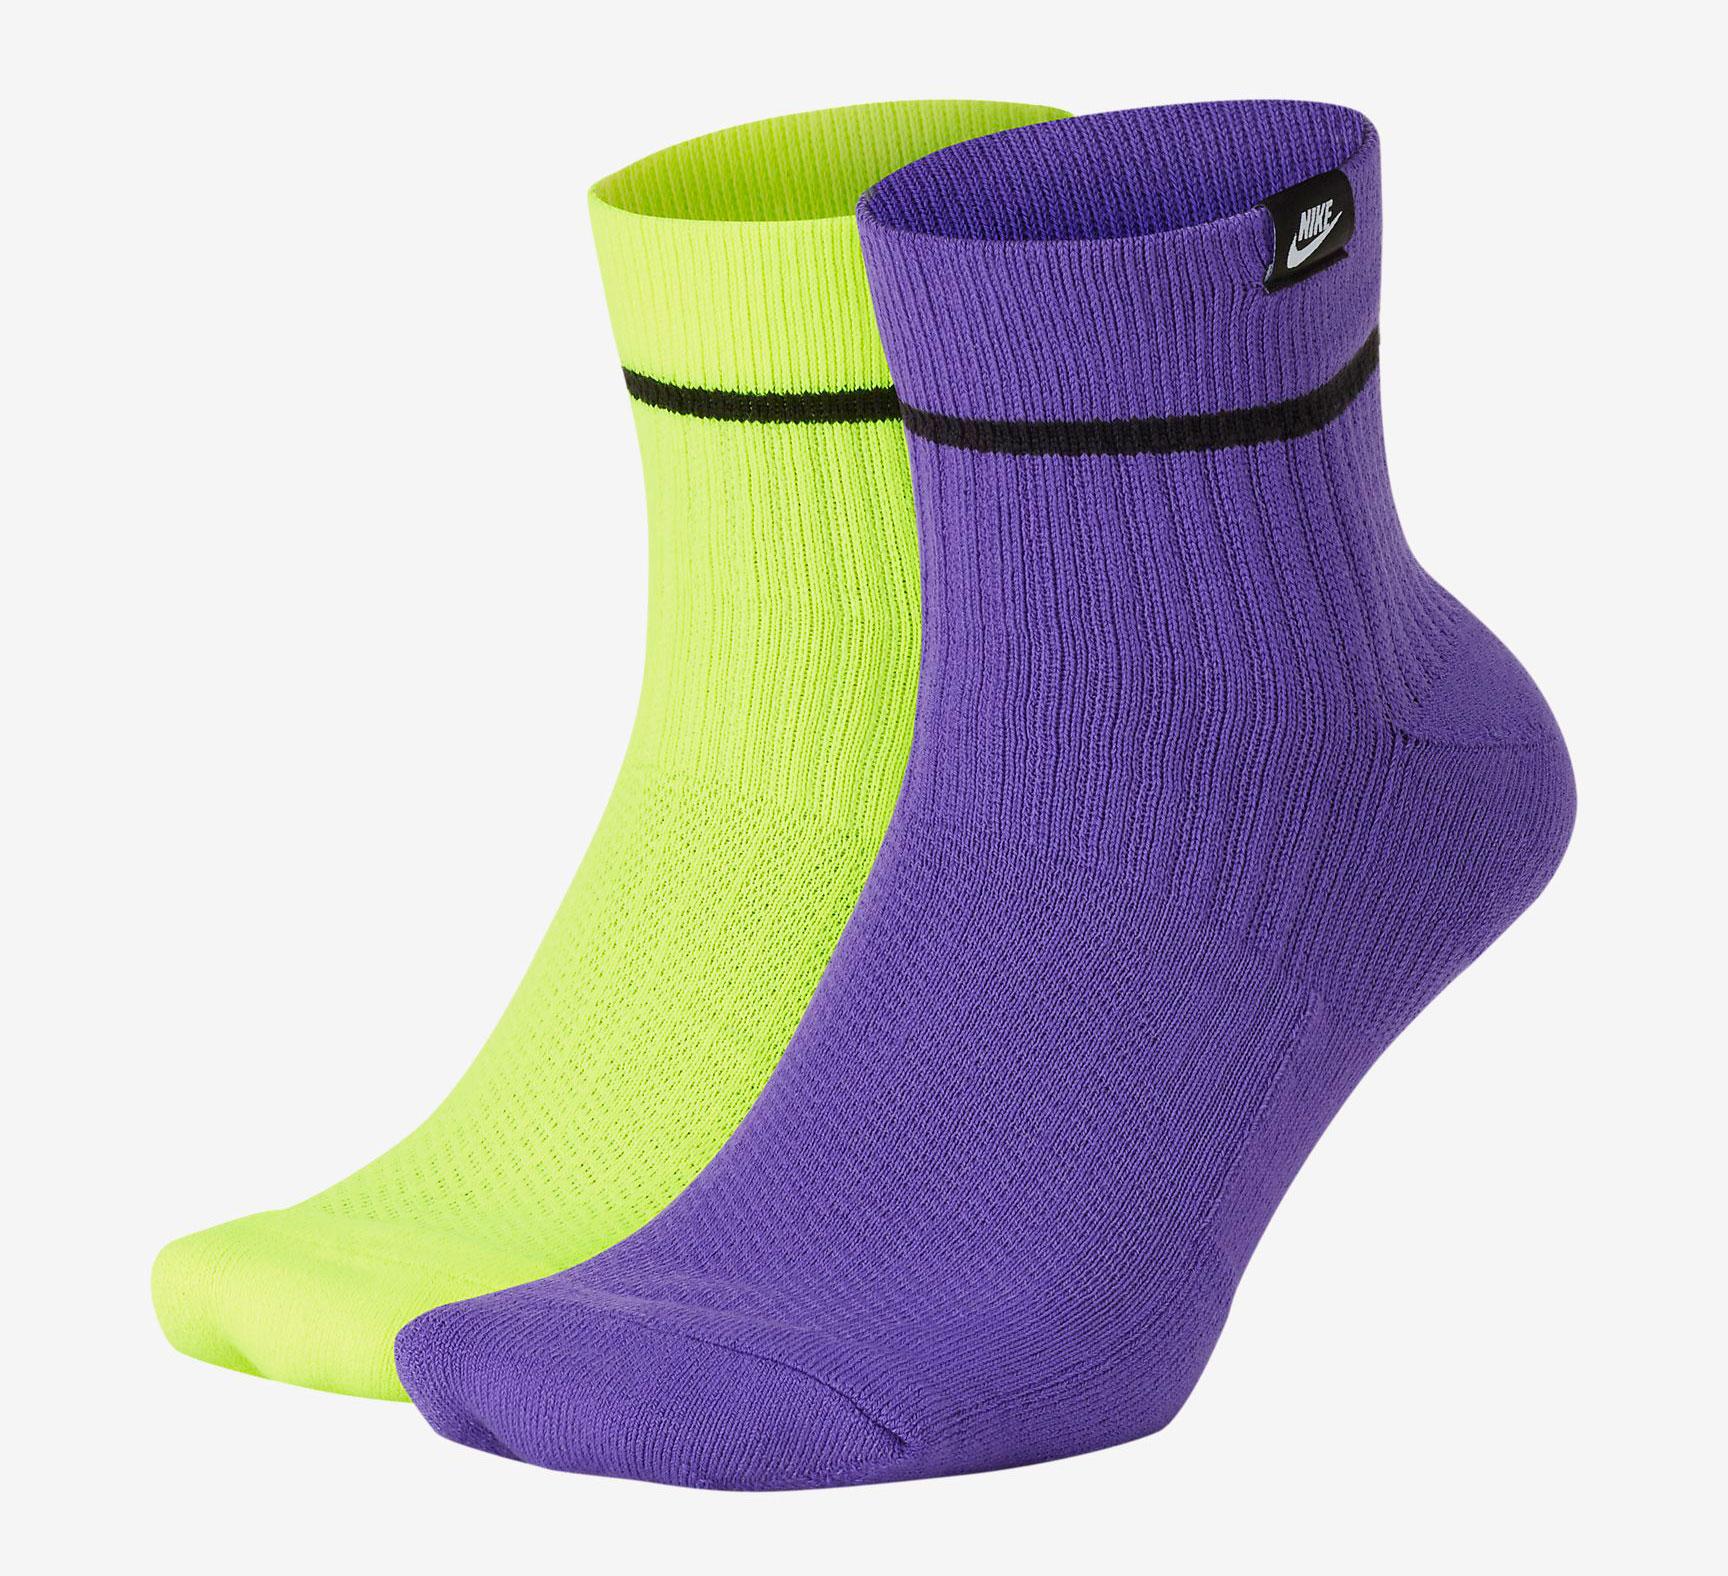 nike-pg-4-gatorade-socks-match